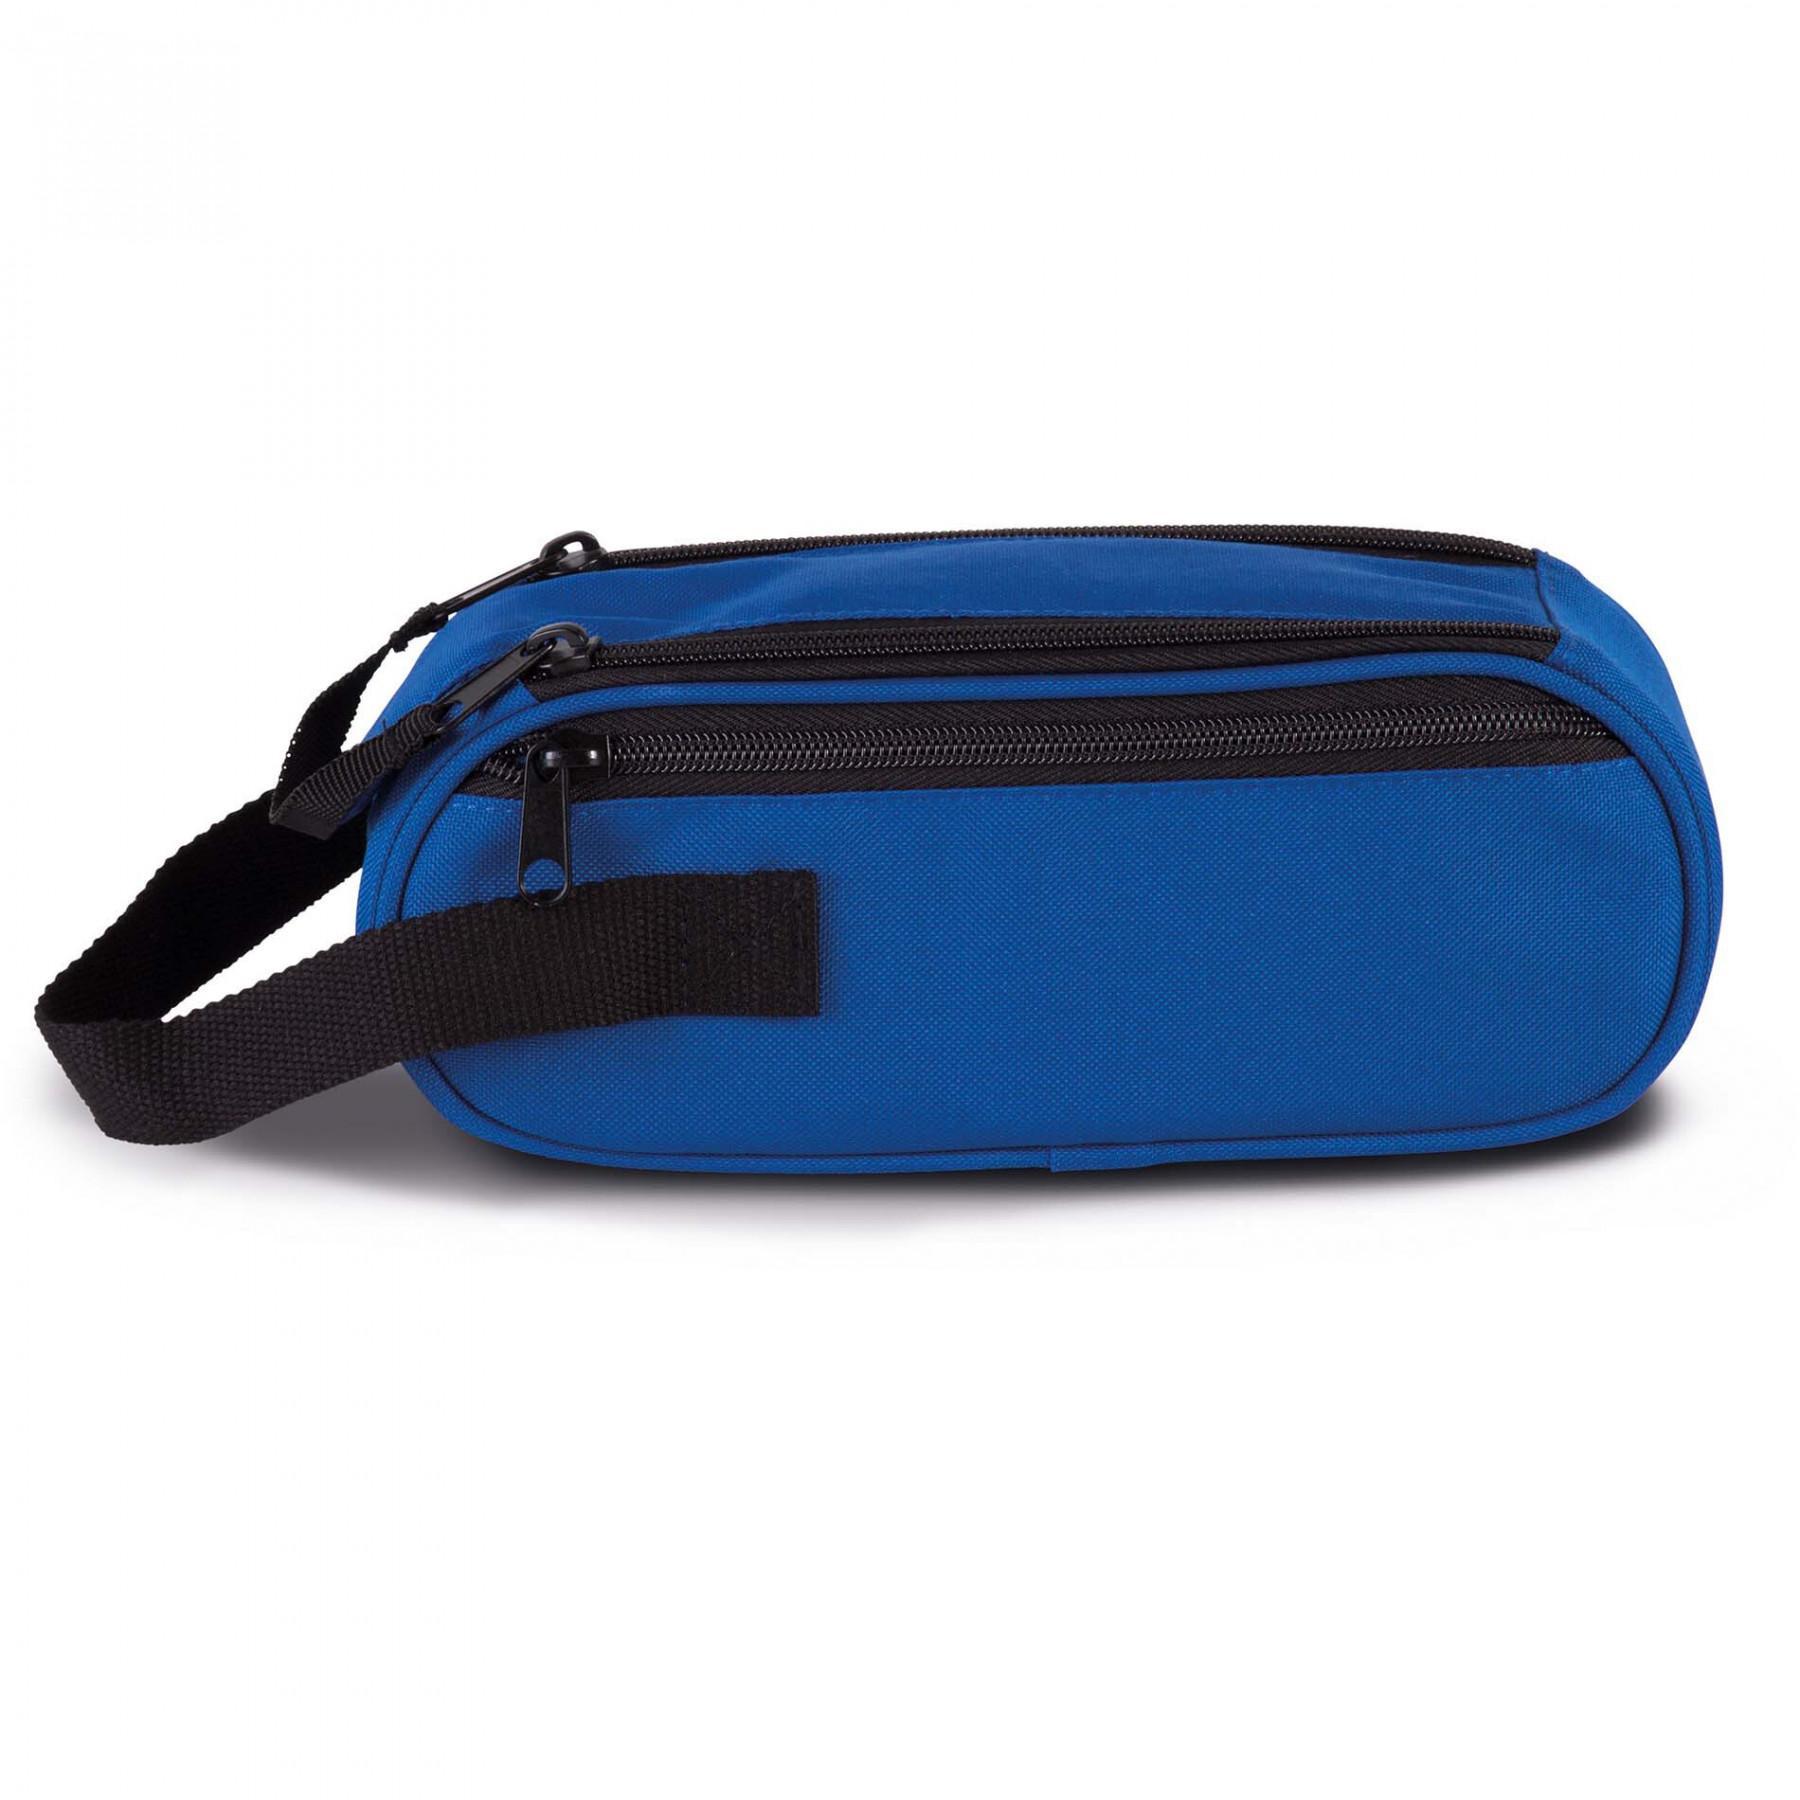 Bag Kimood de Pétanque Semi-Rigide